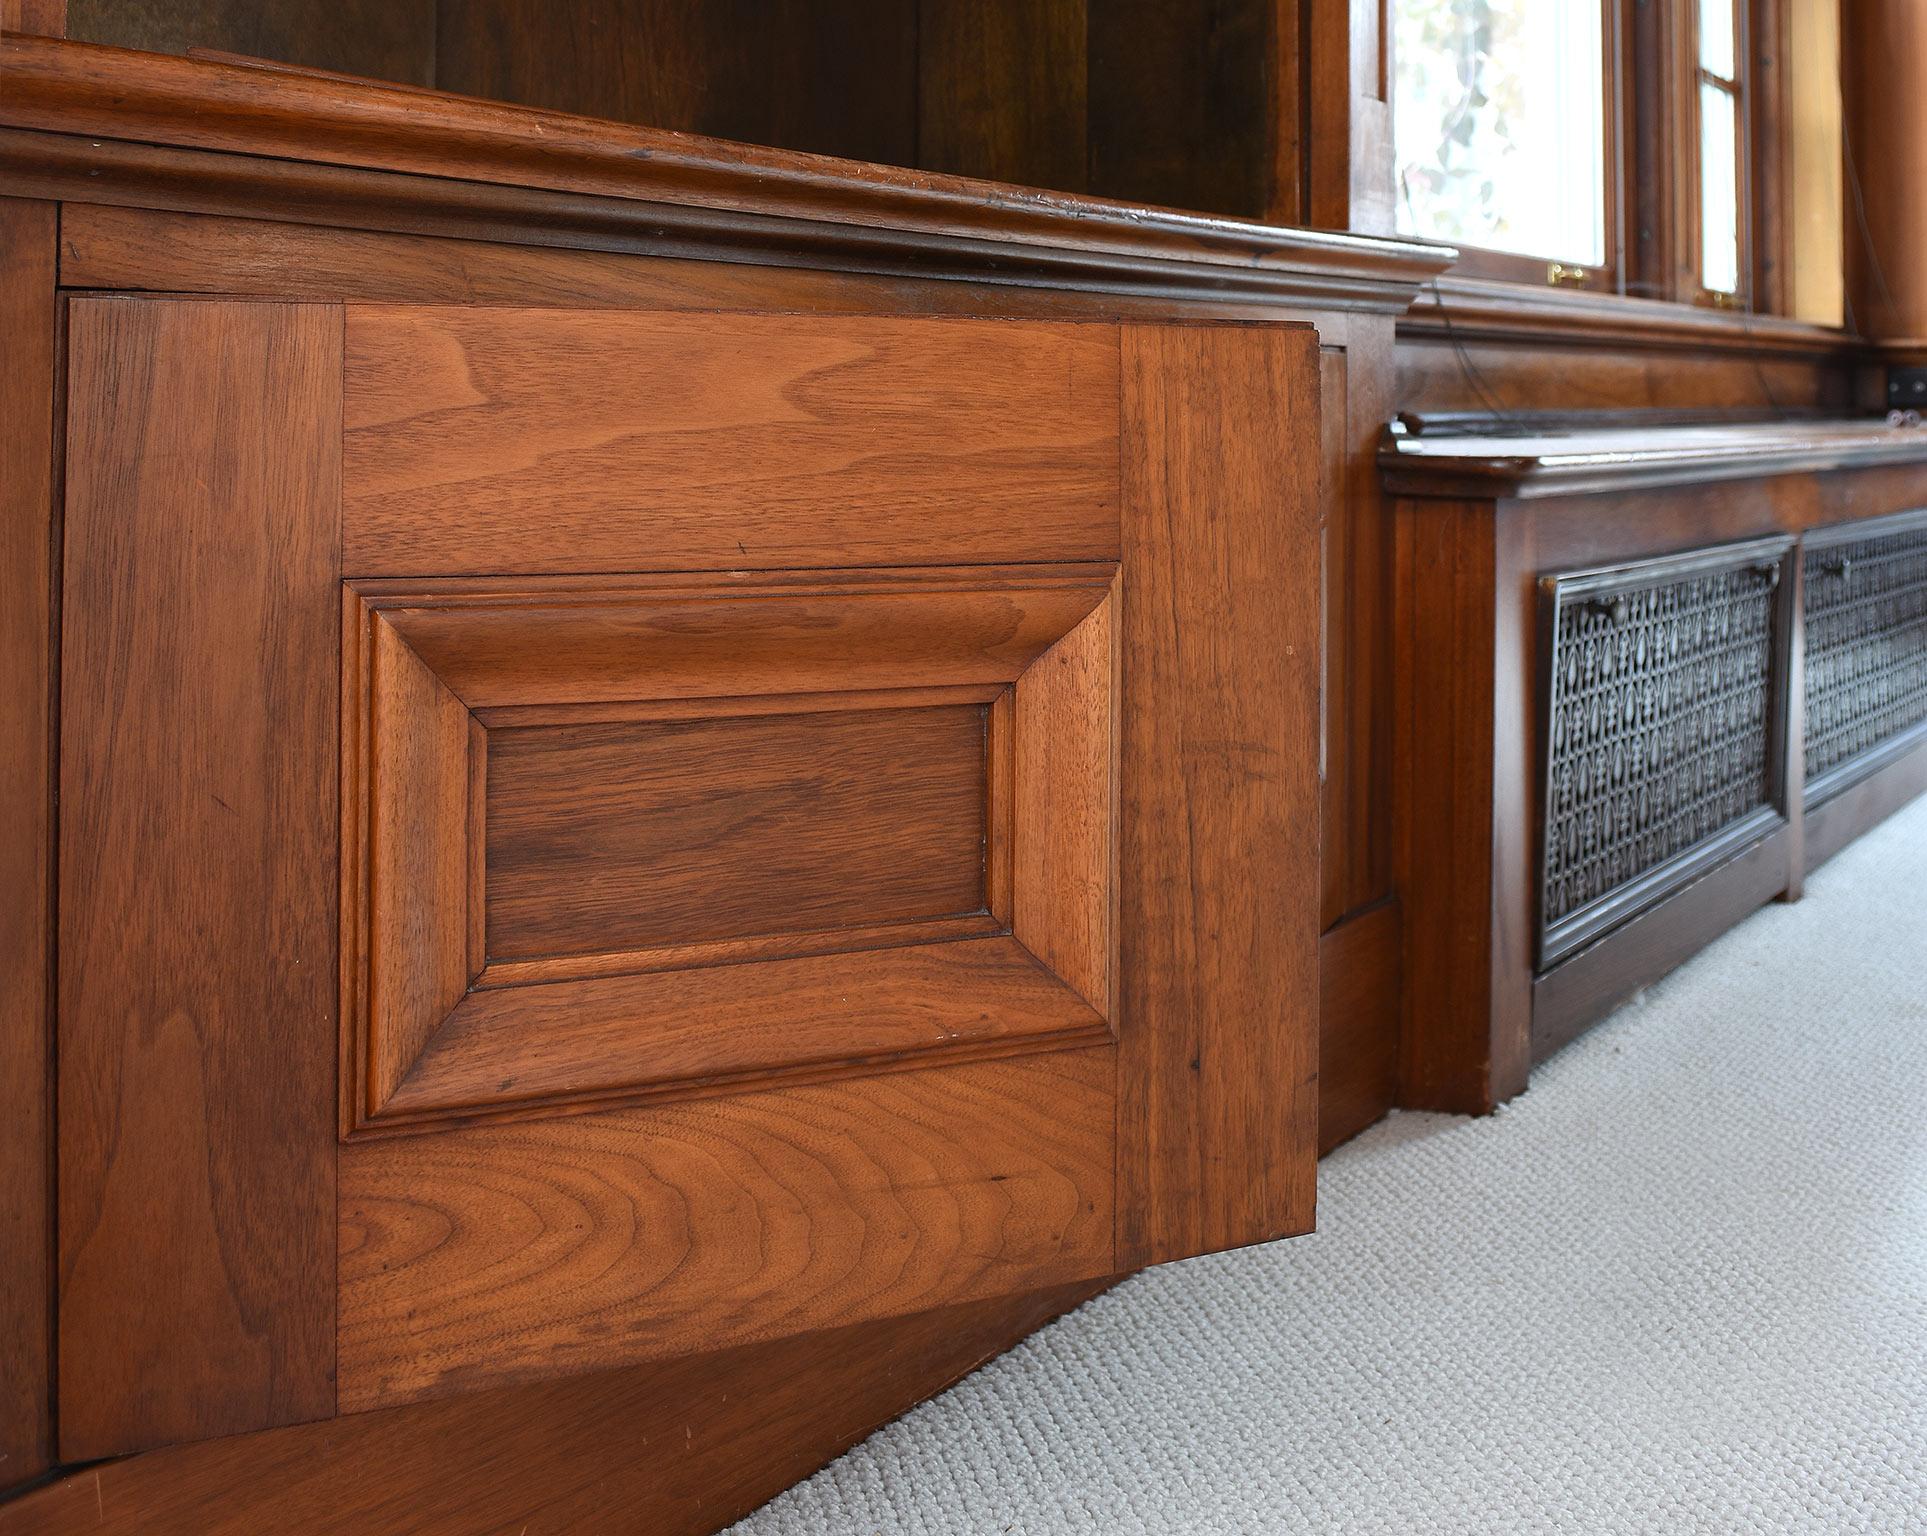 maher-cabinet.jpg